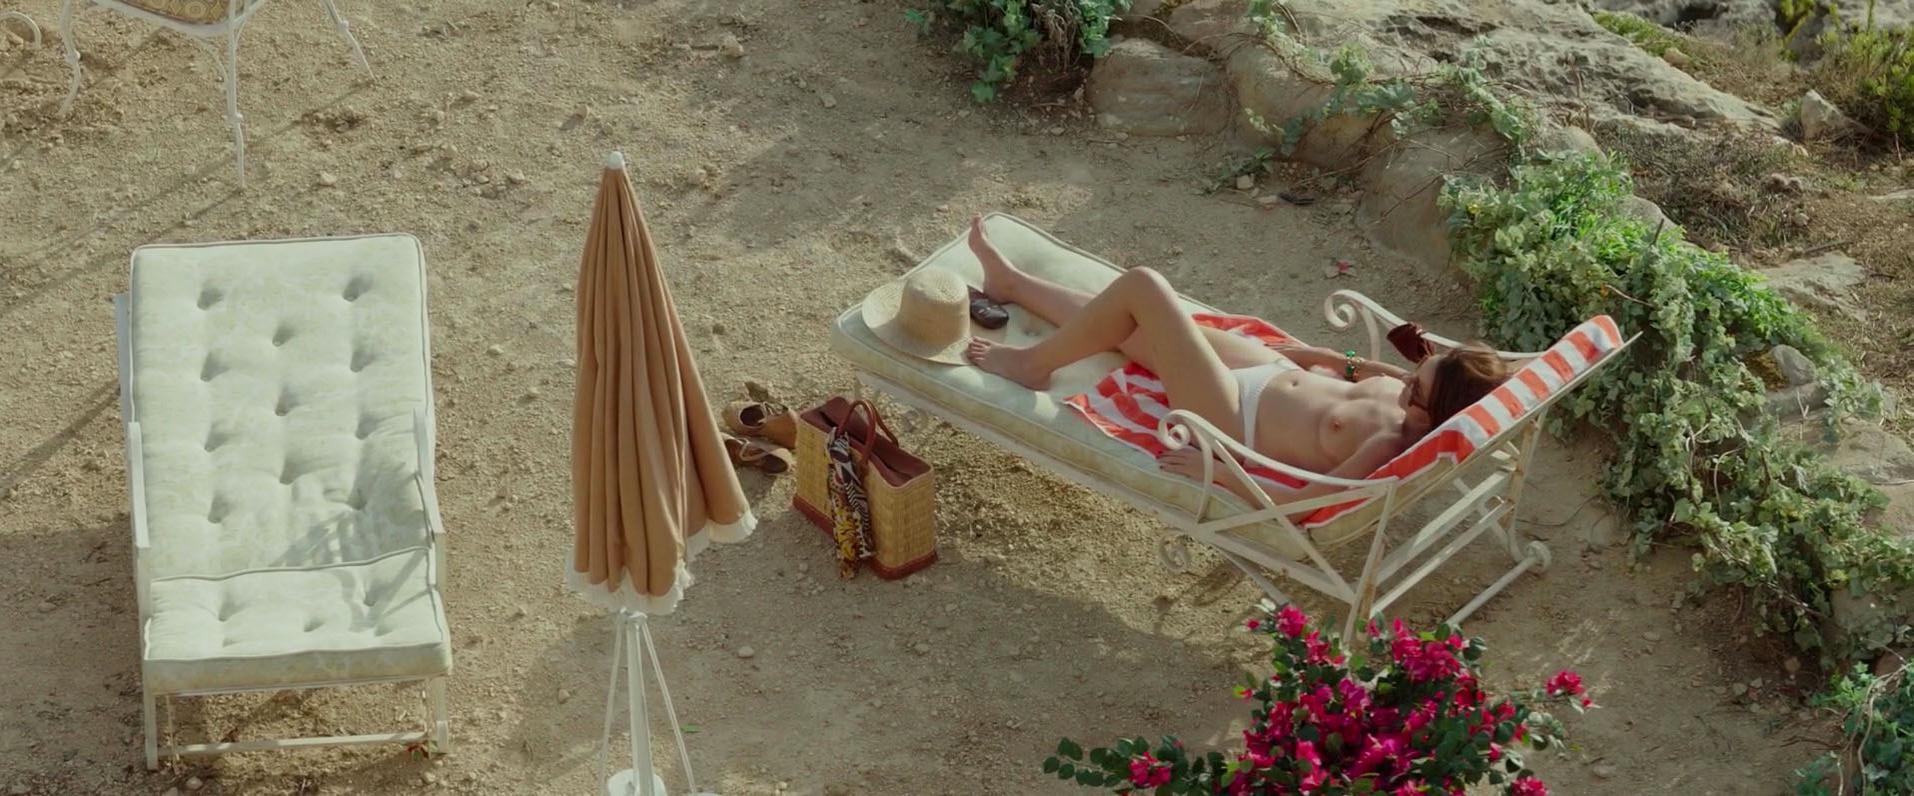 Melanie Laurent nude - By The Sea (2015)